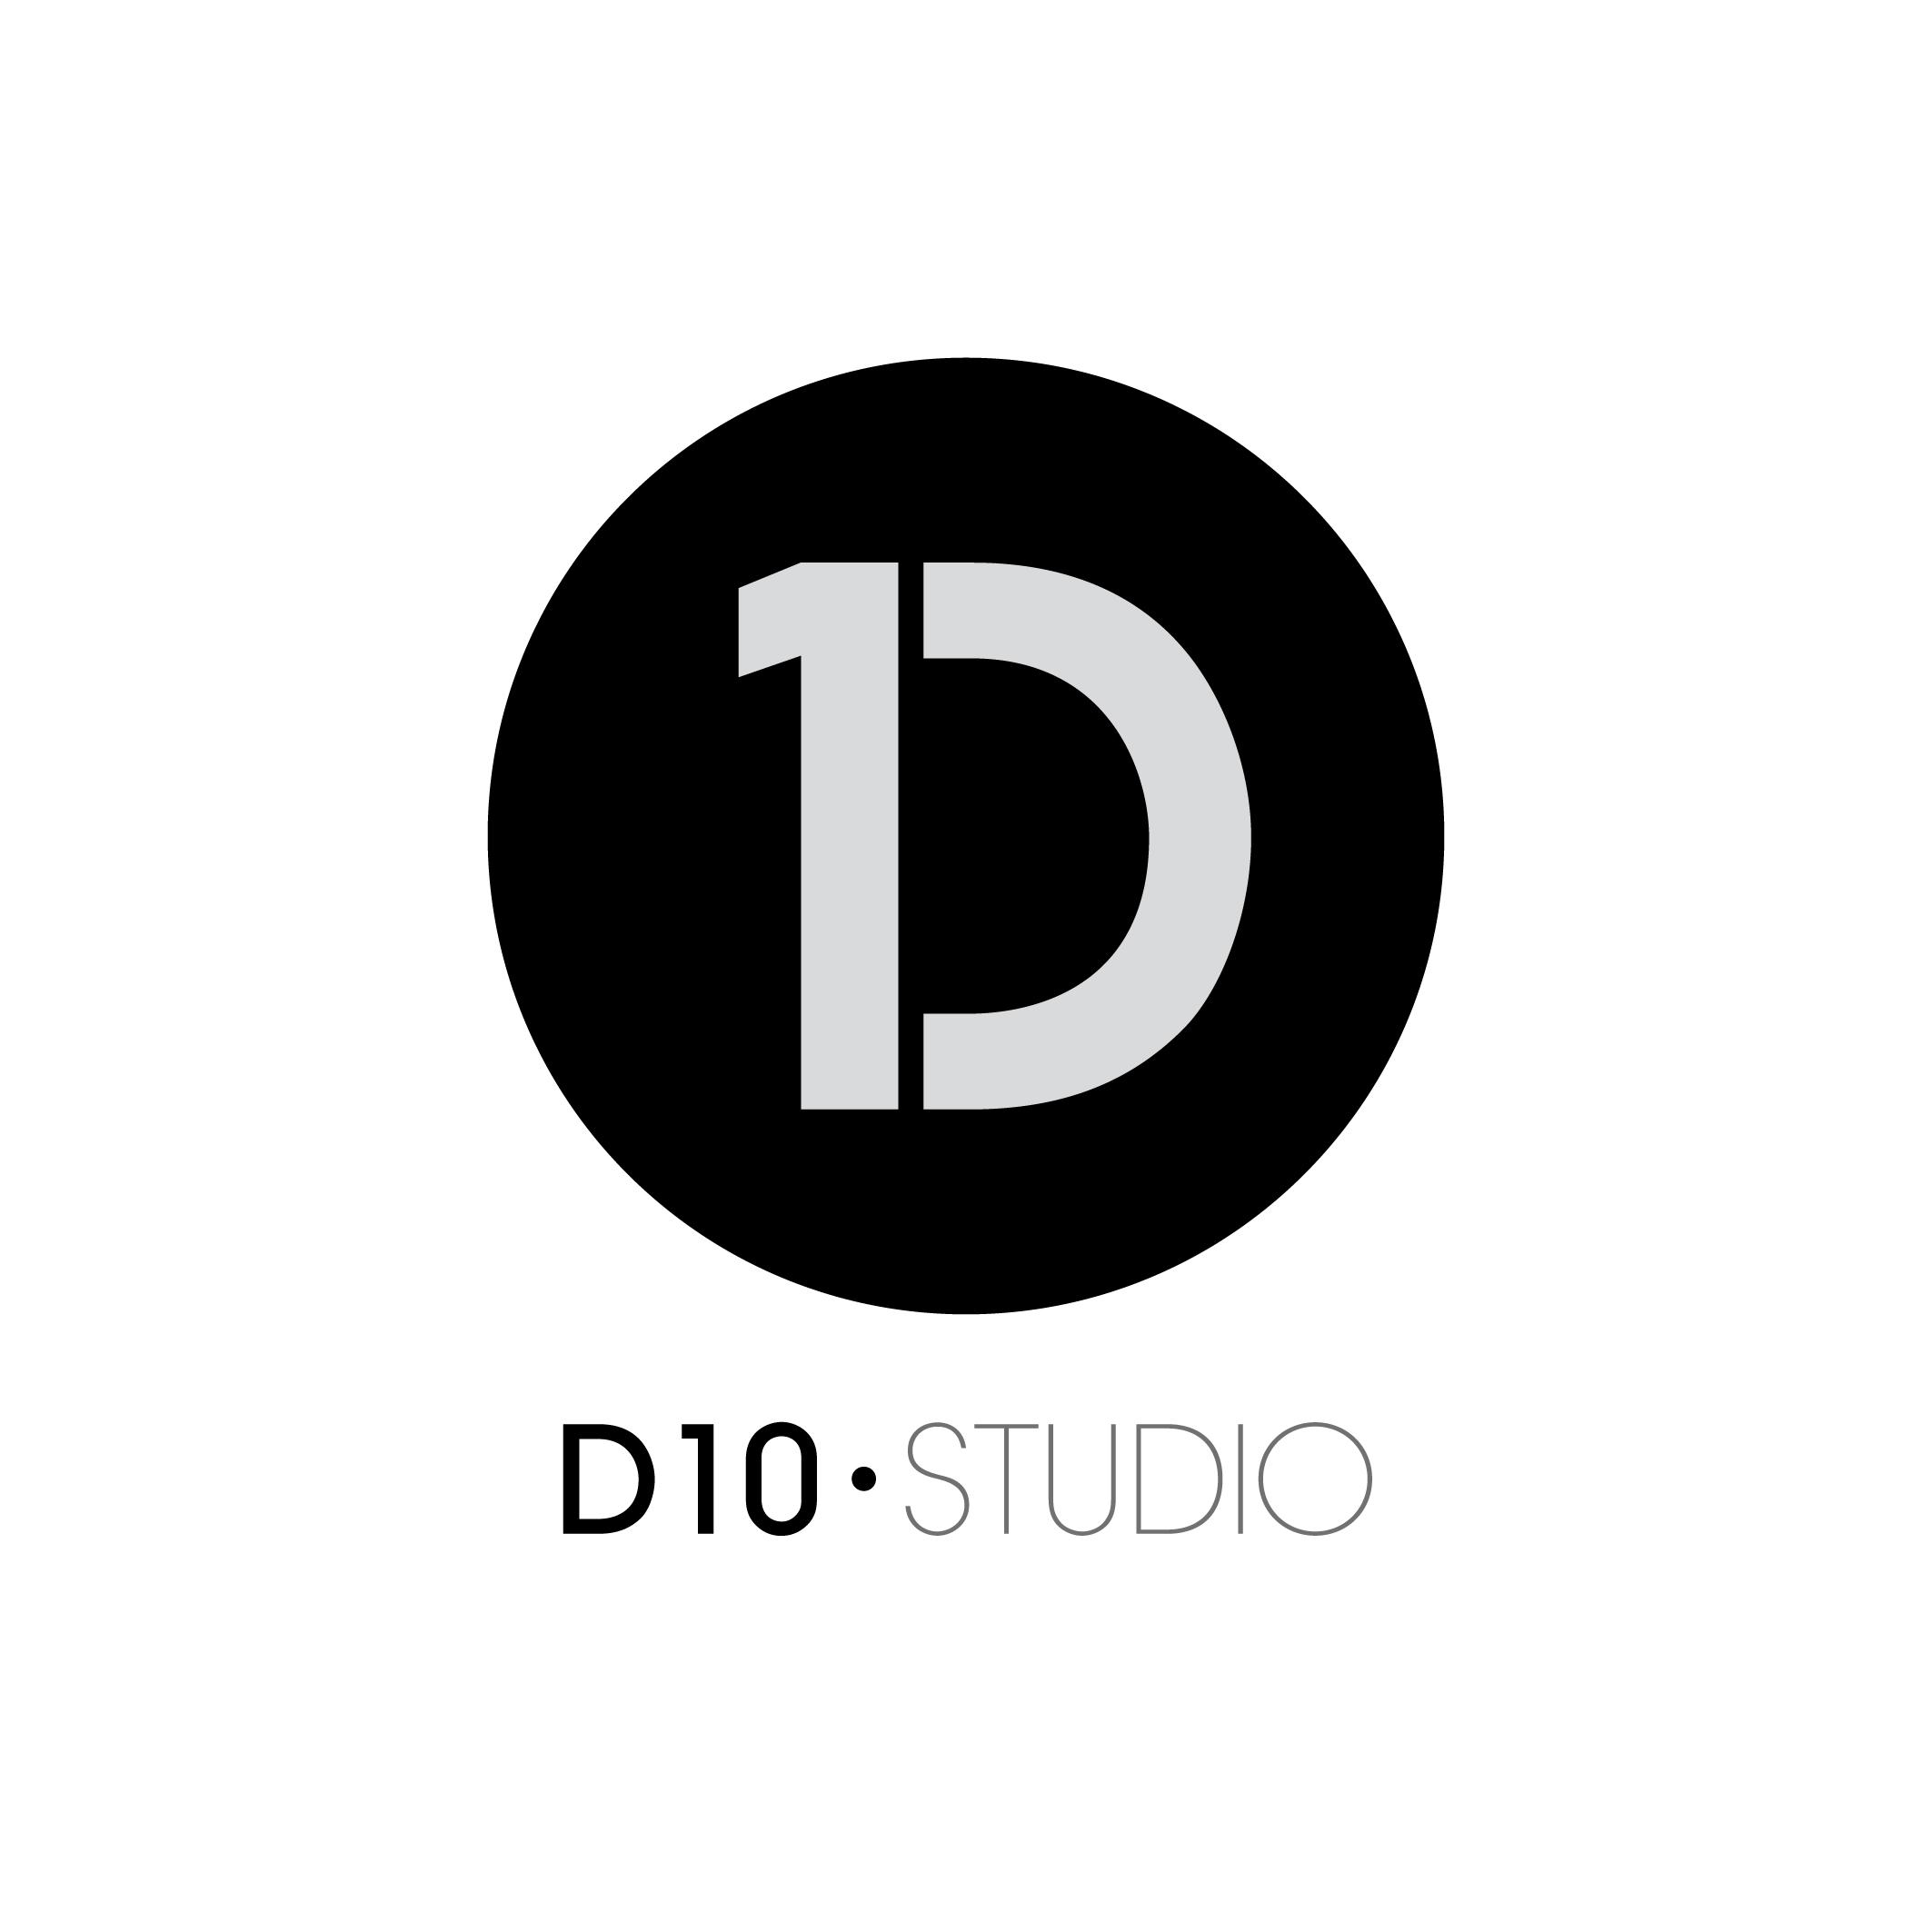 D10 Studio logo